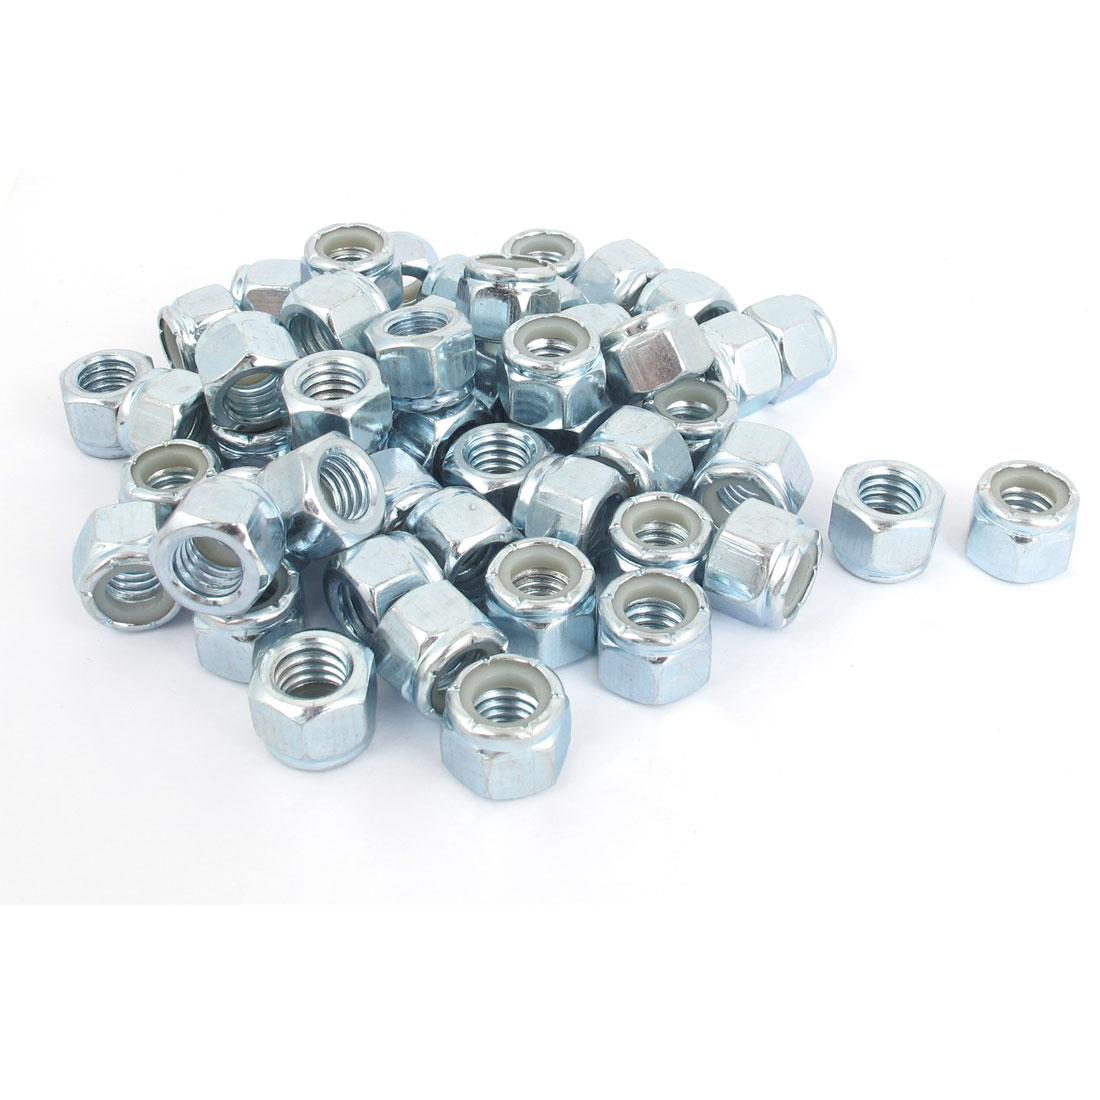 "3/8""-16 Zinc Plated Self-Locking Nylock Nylon Insert Hex Lock Nuts 100Pcs"